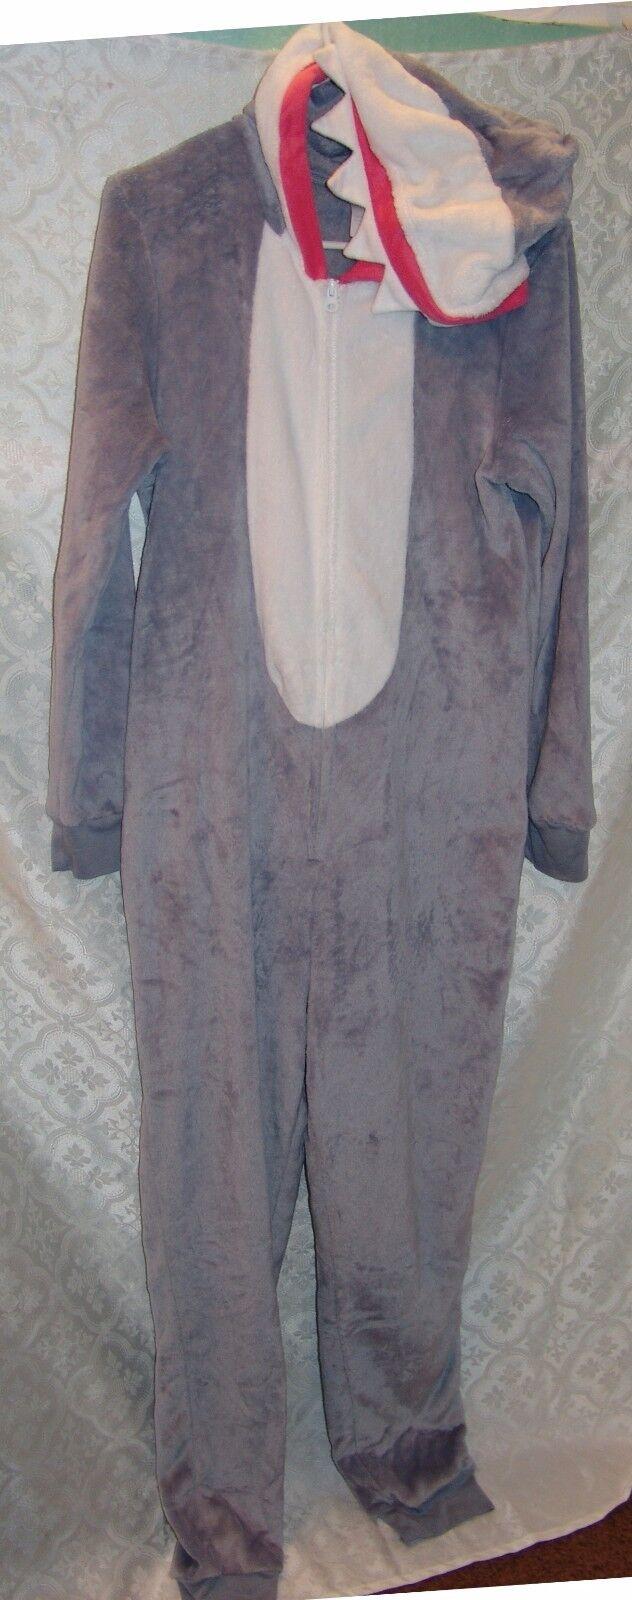 Secret Treasures L 12 - 14 Plush Shark Costume One Piece Pajamas PJ Soft Zip